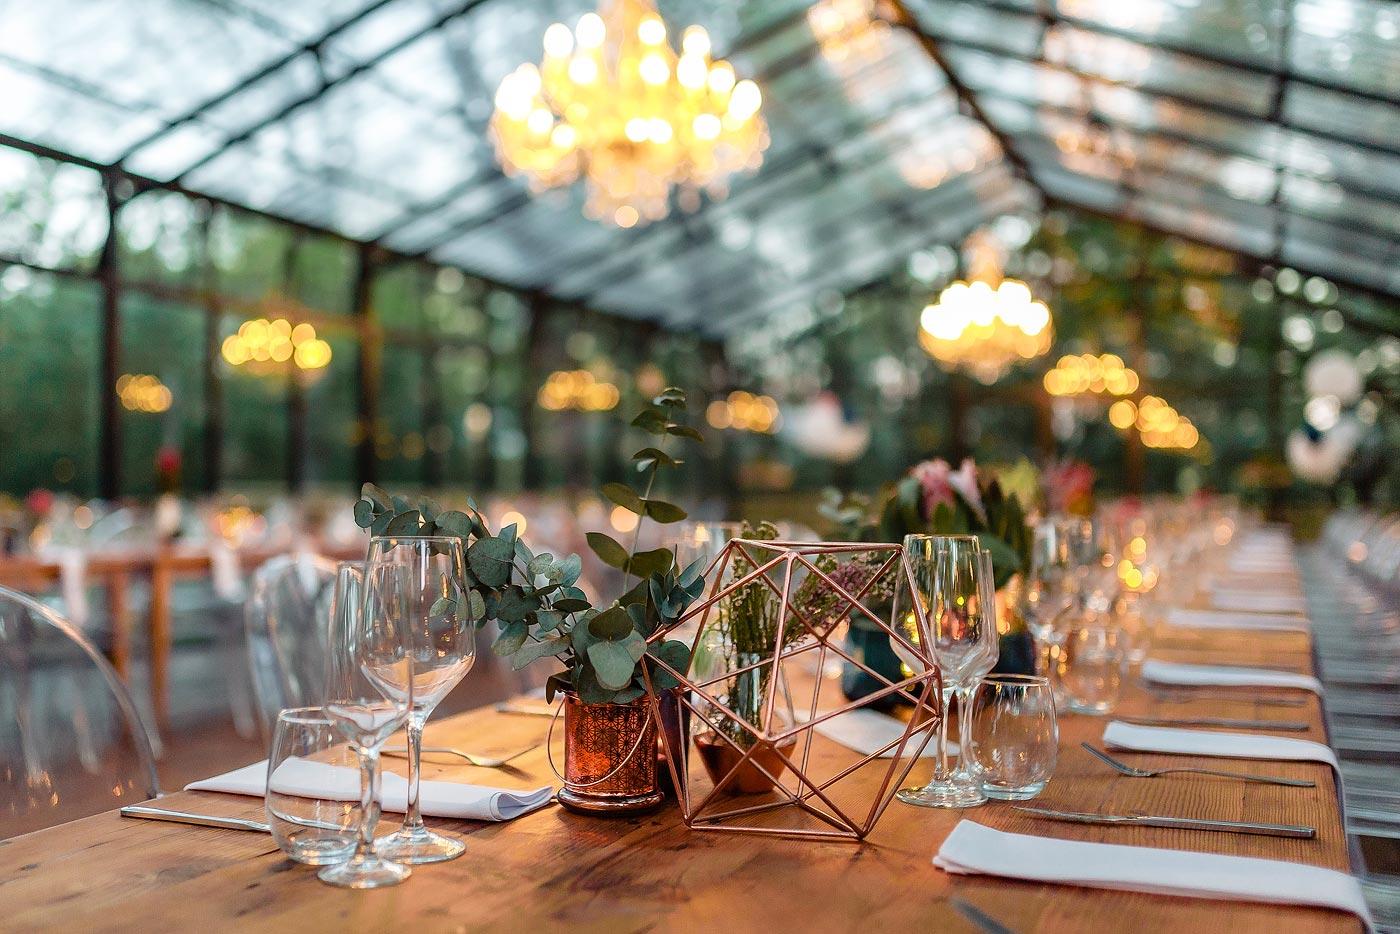 Delicate wedding decor details